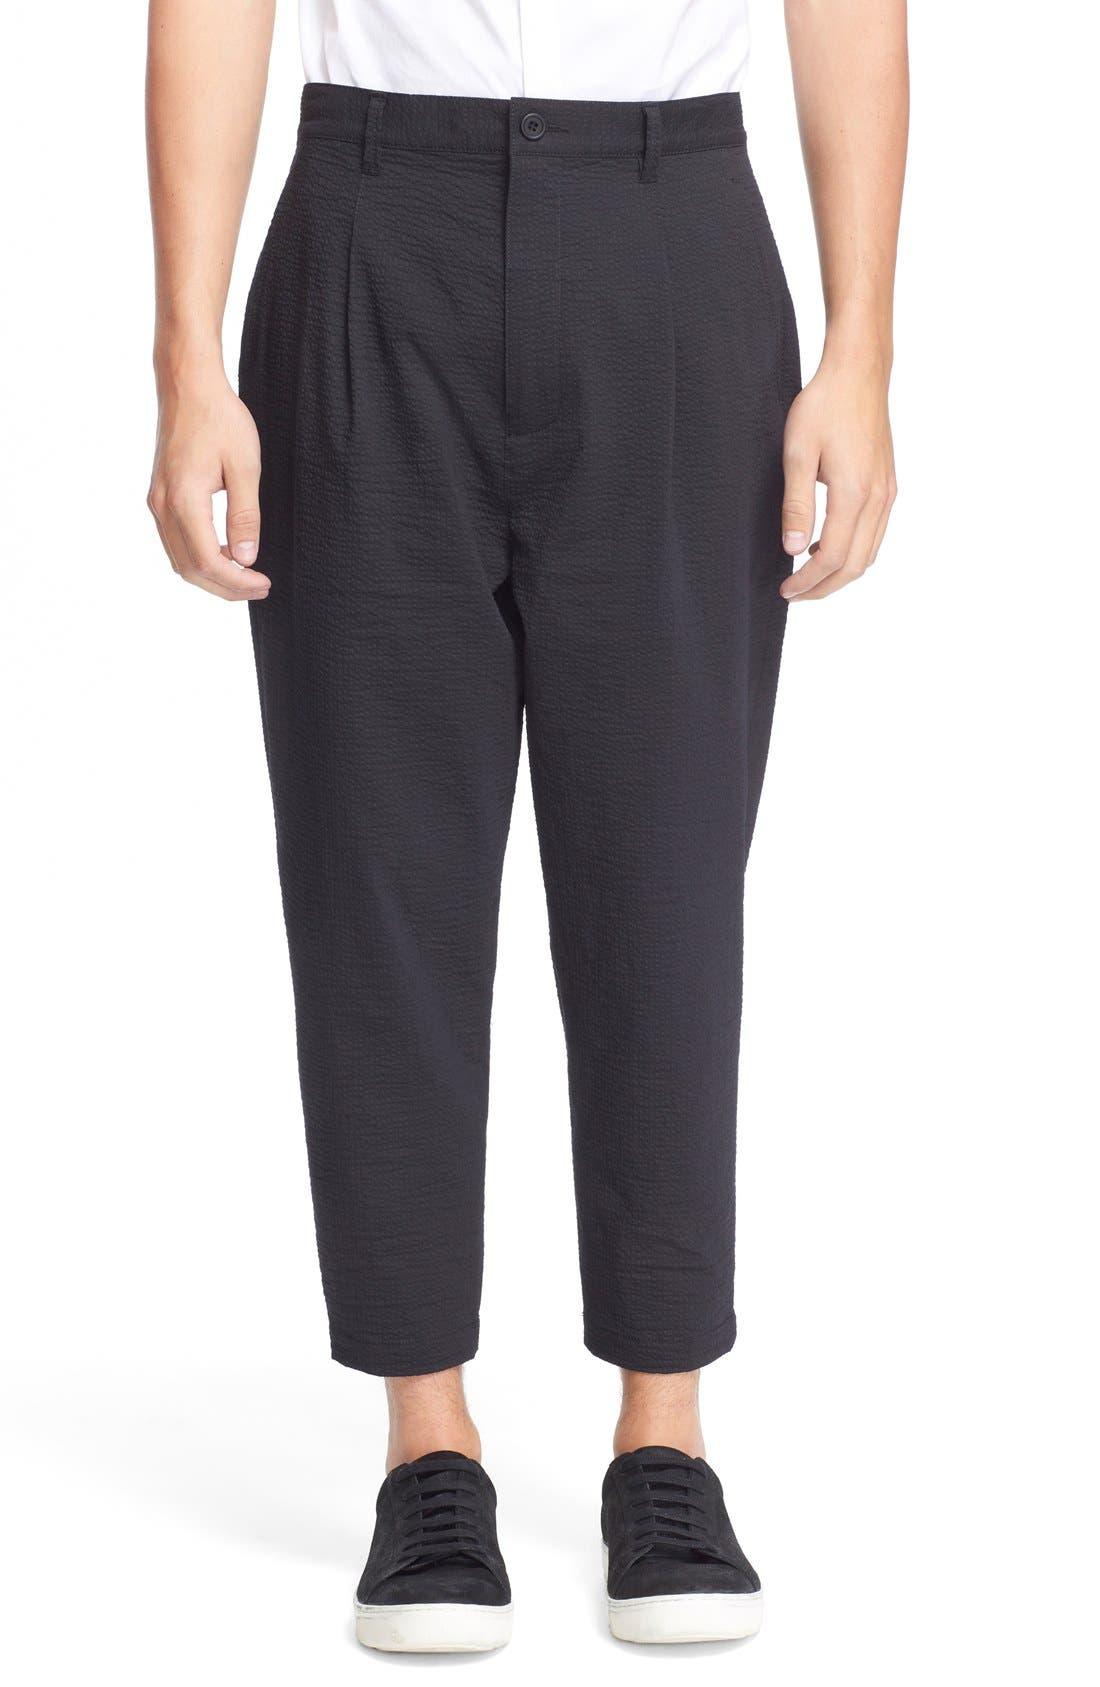 HELMUT LANG, Seersucker Trousers, Main thumbnail 1, color, 001